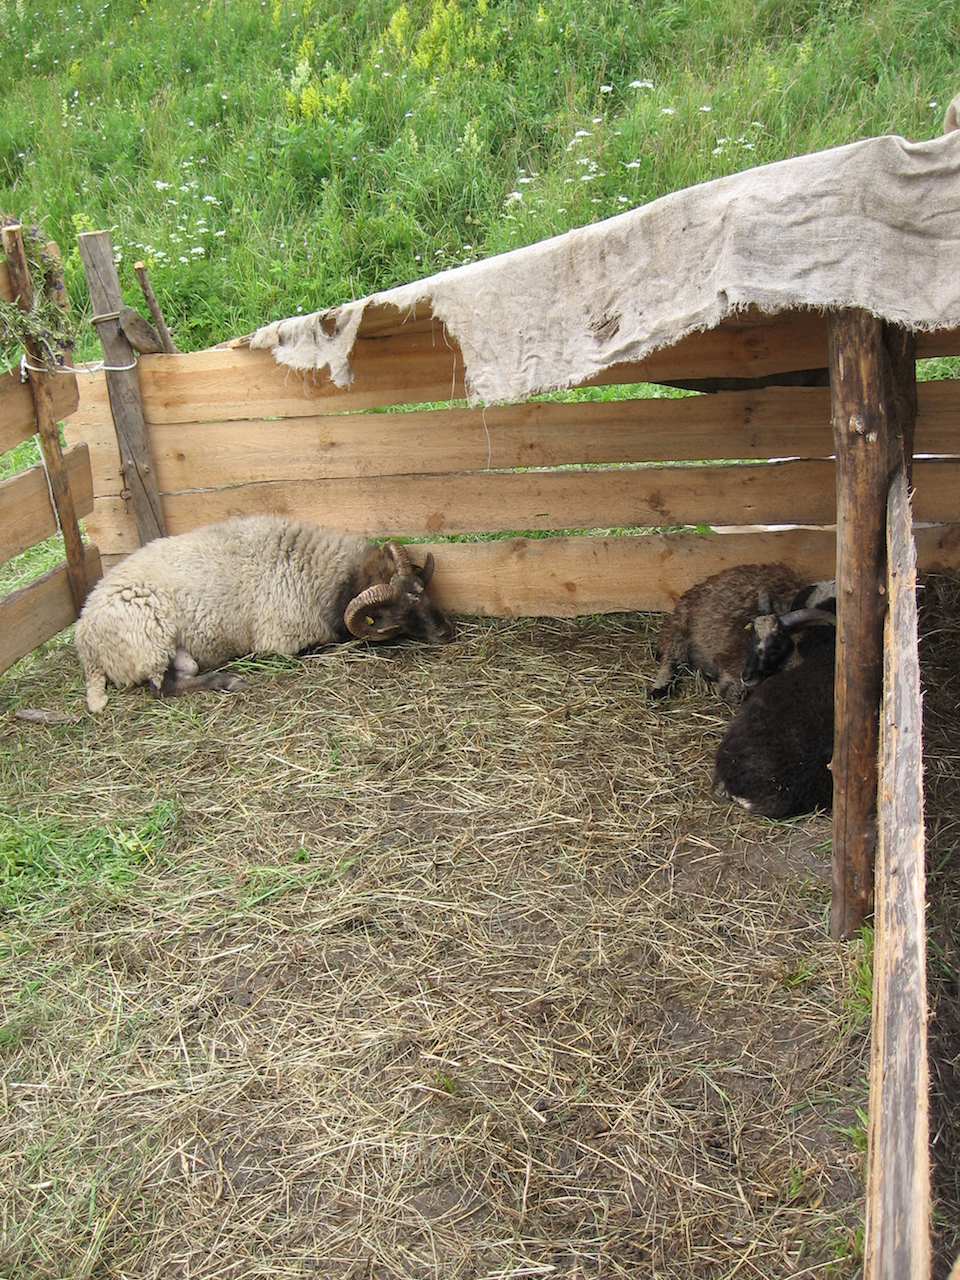 Lithuanian Coarse Wool Sheep IMG_1437